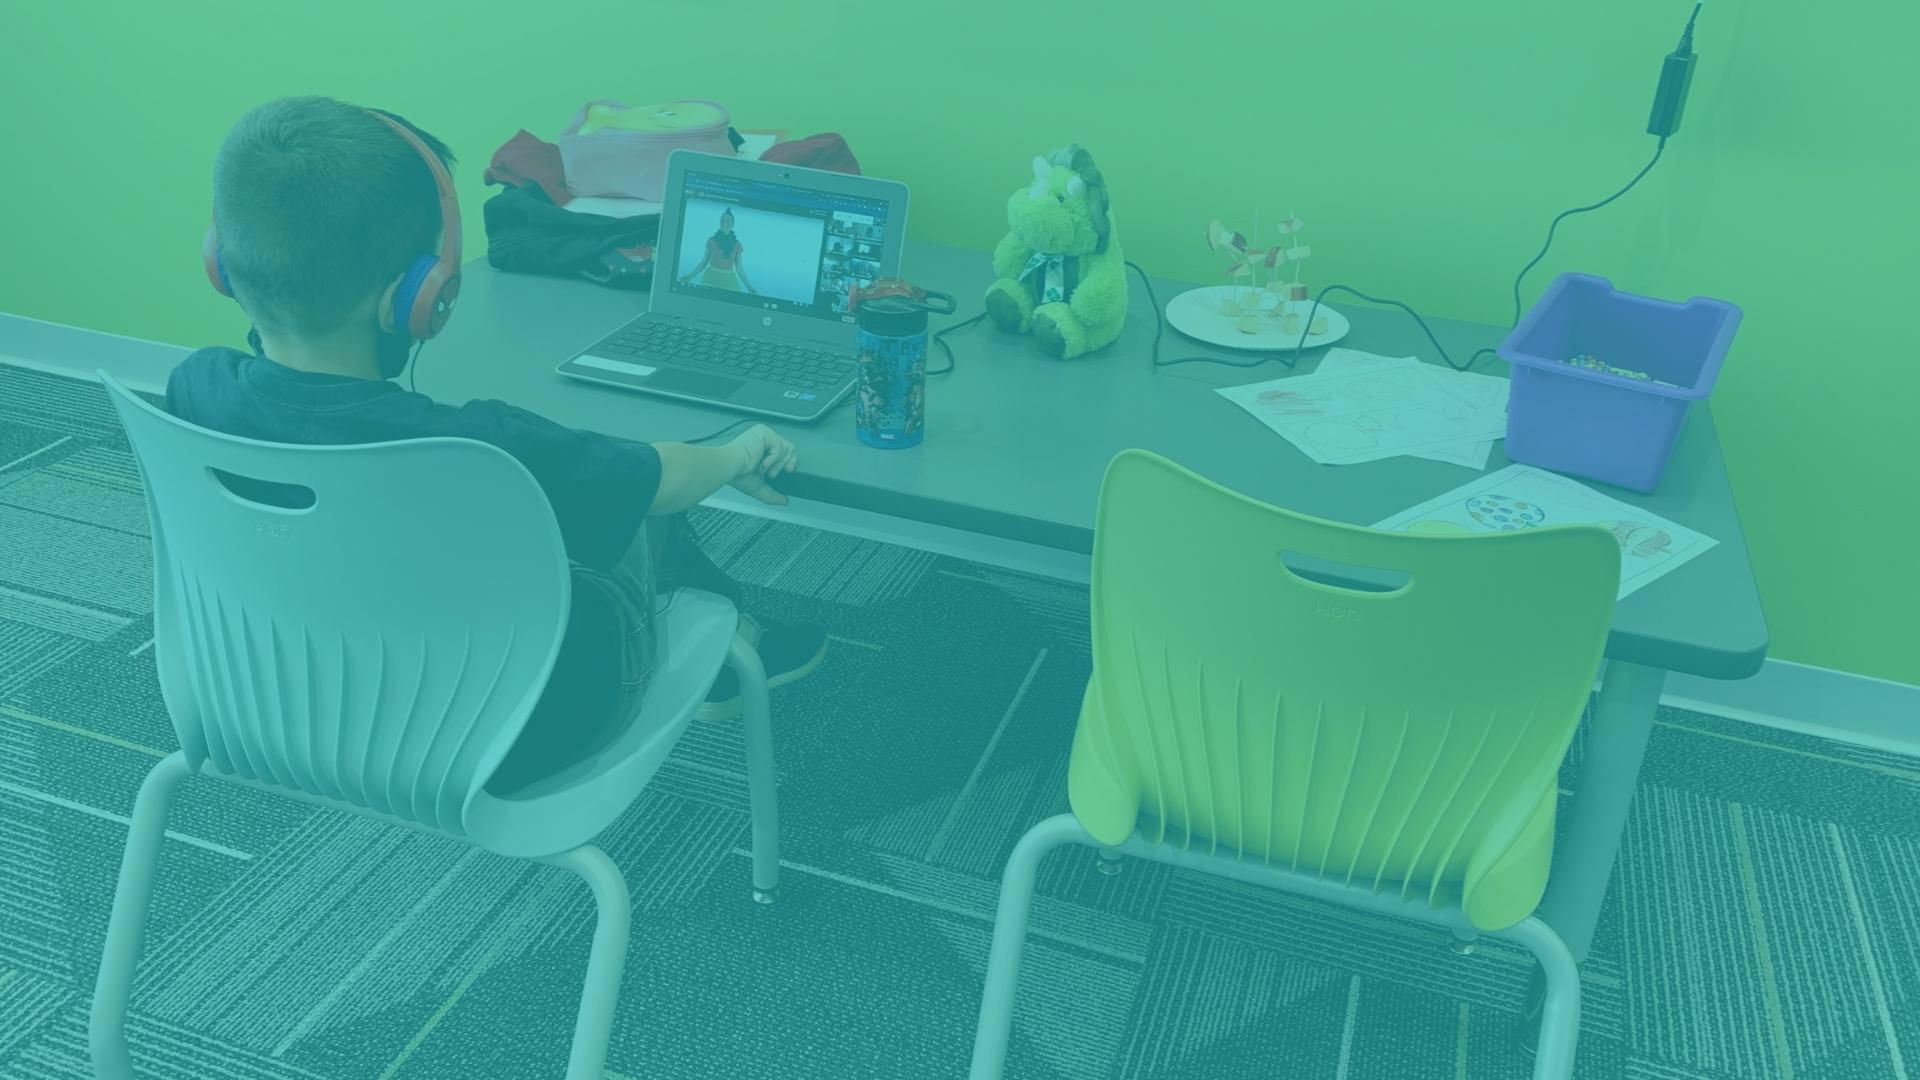 KC CNY Remote Learning Center